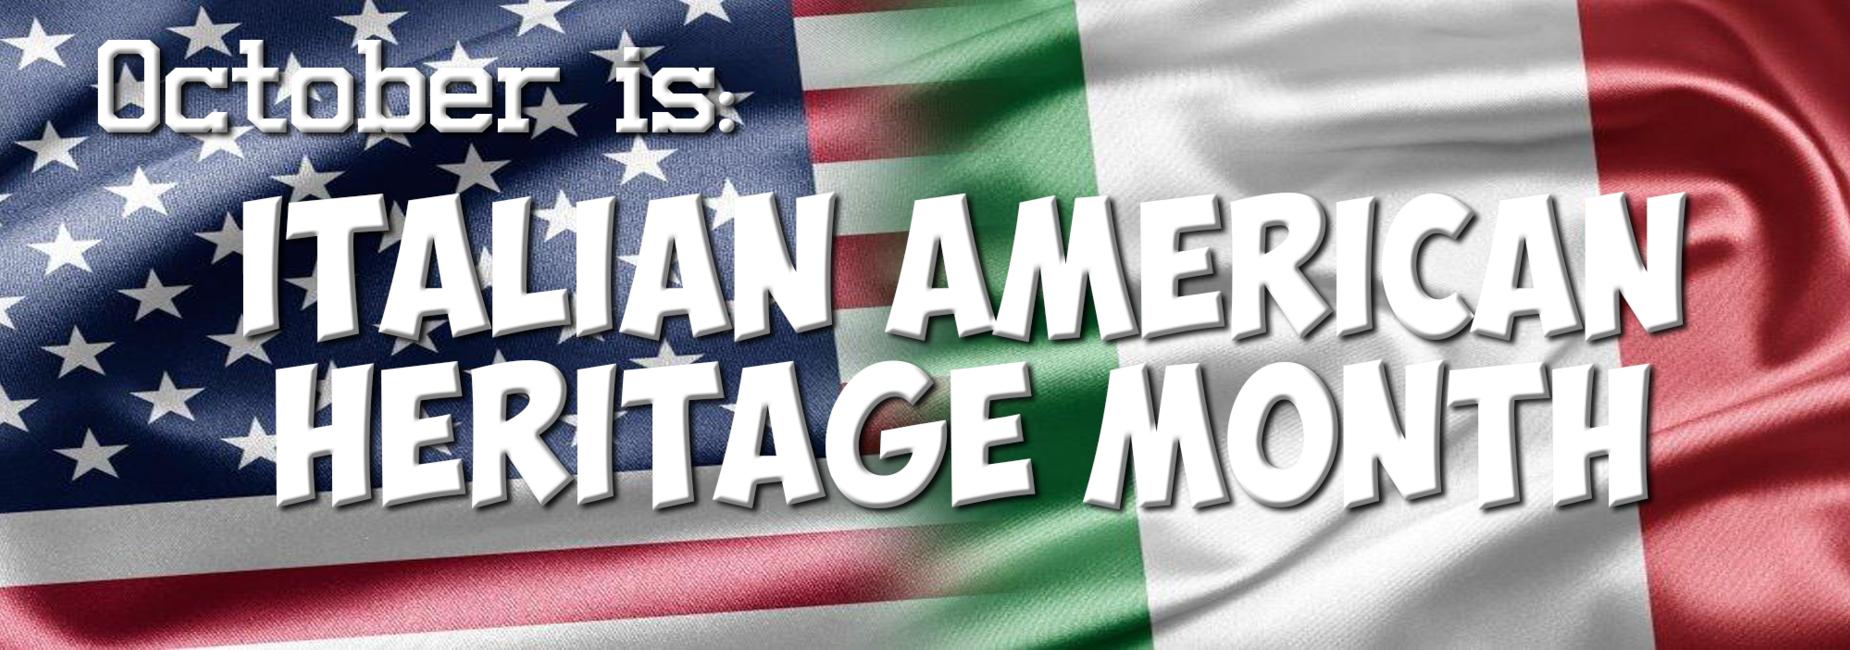 October is Italian American Heritage Month